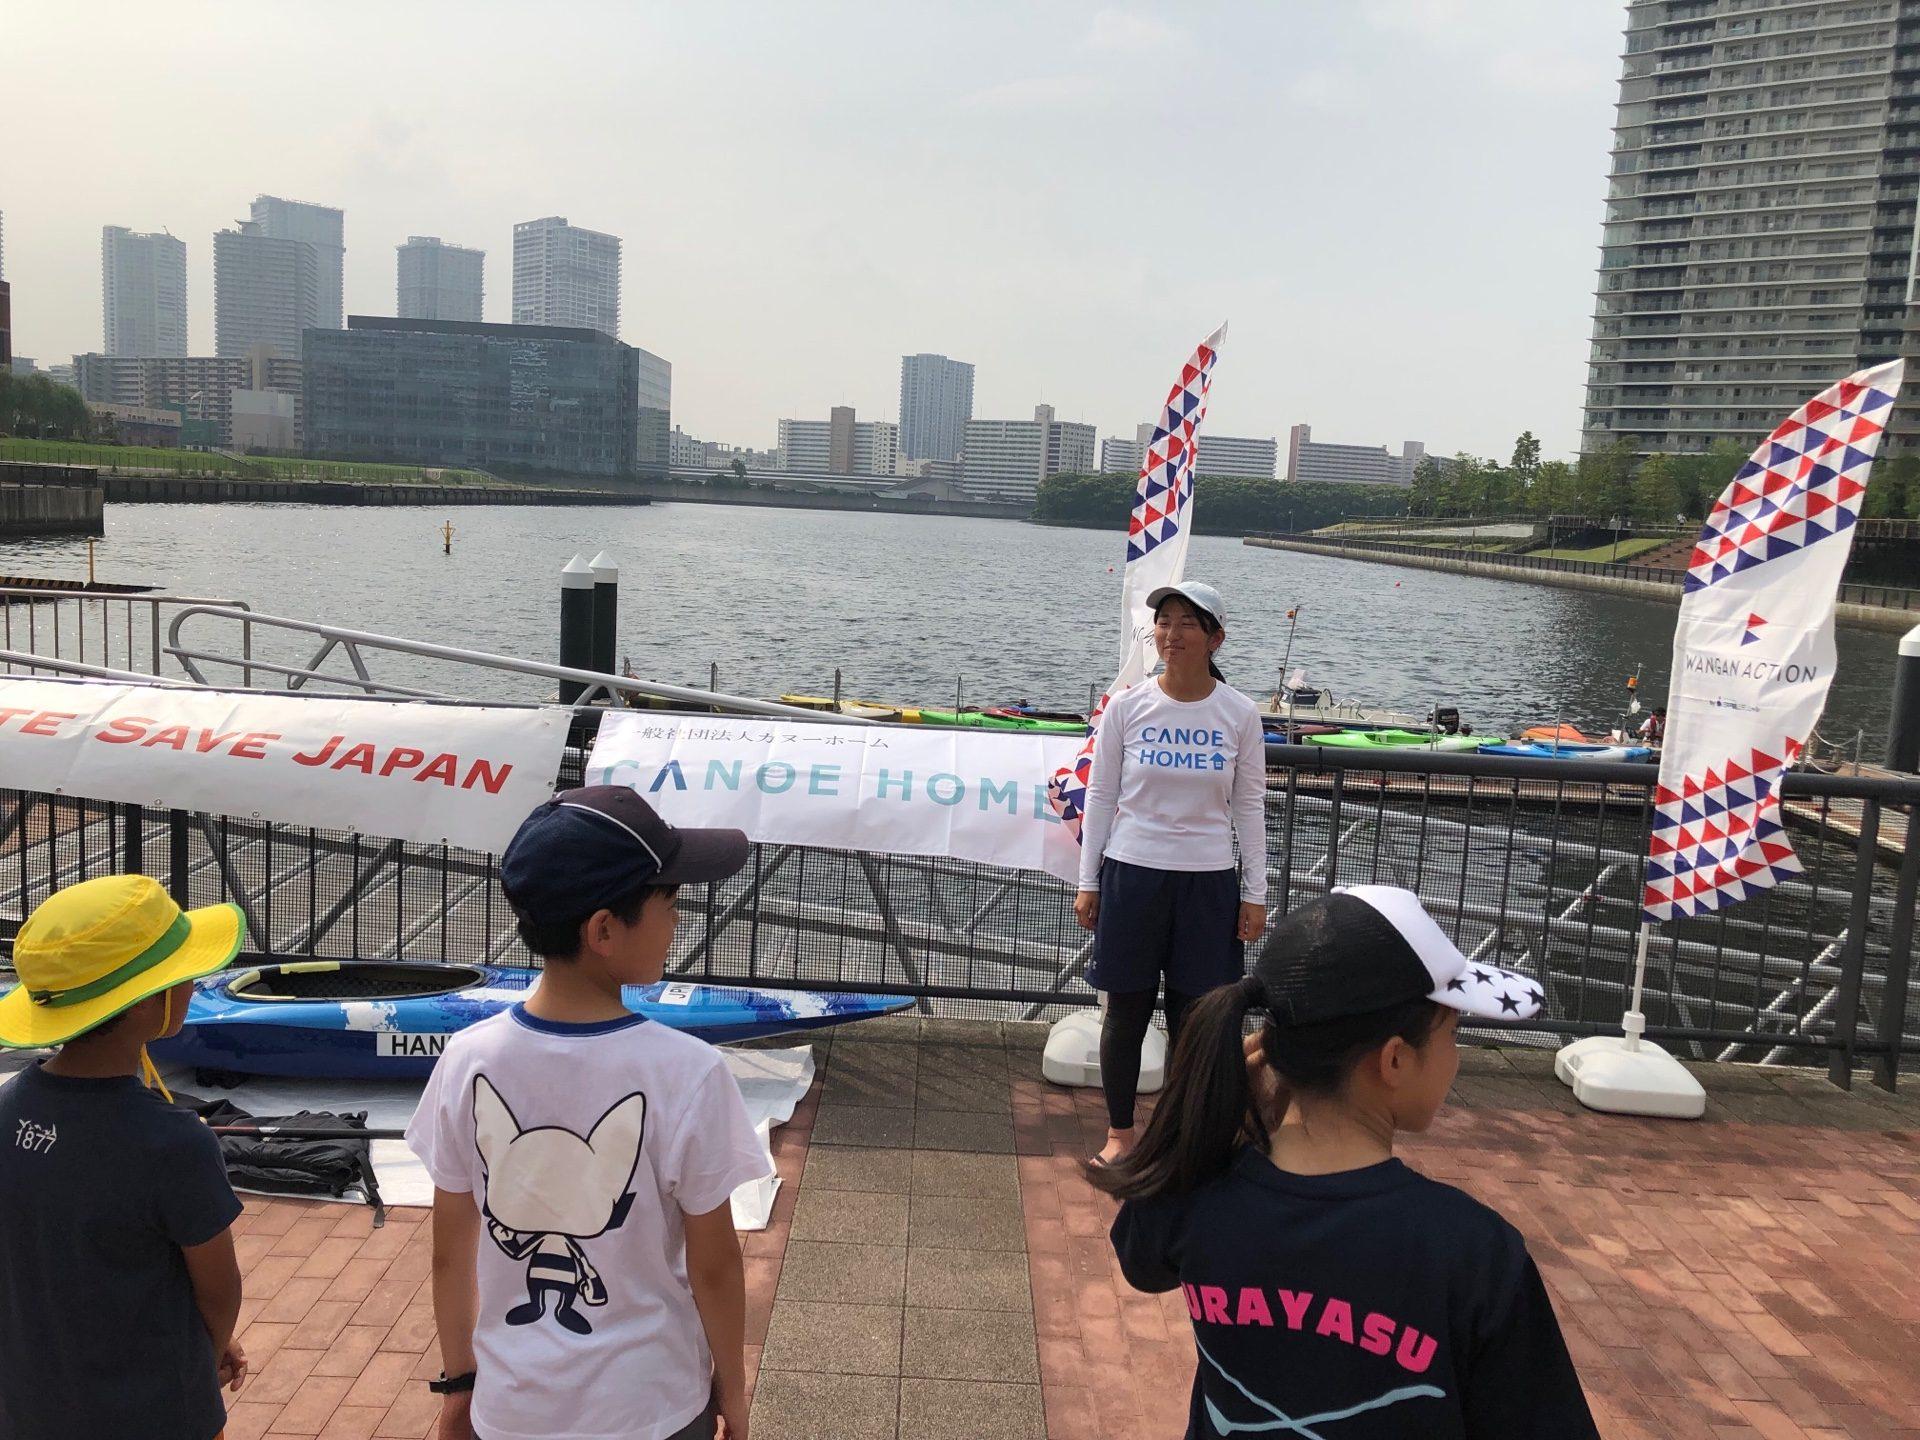 WANGAN ACTION スポーツアカデミー・カヌー教室&いのちの教室